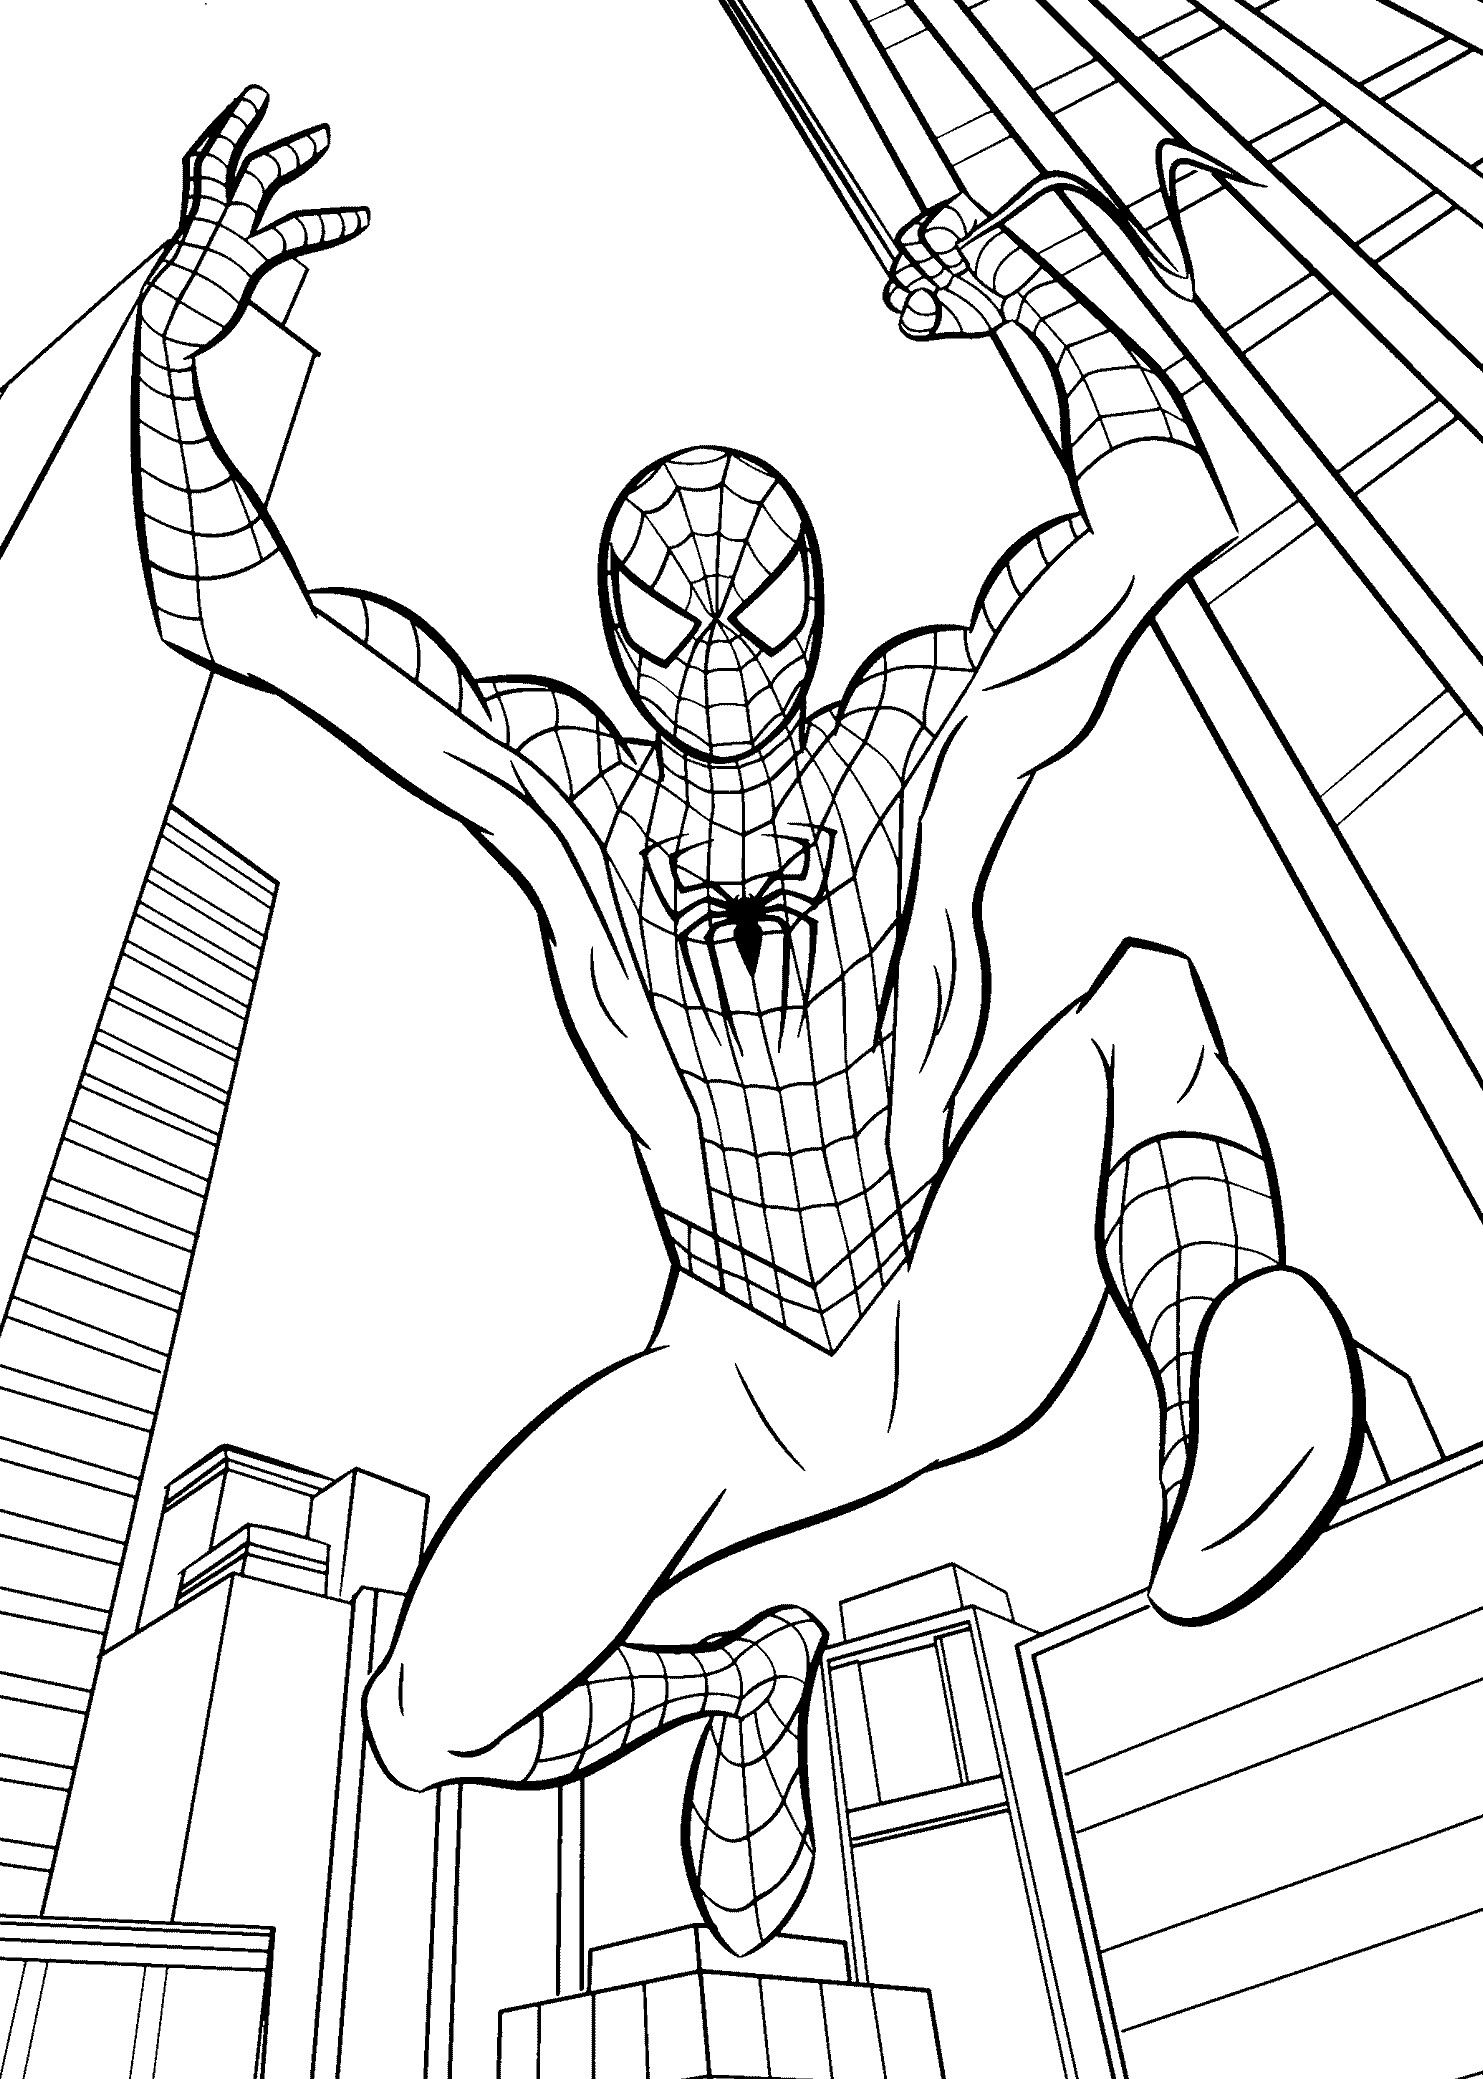 Unlock spider man colouring pages strange spiderman color sheet guaranteed printable coloring 3 civil war